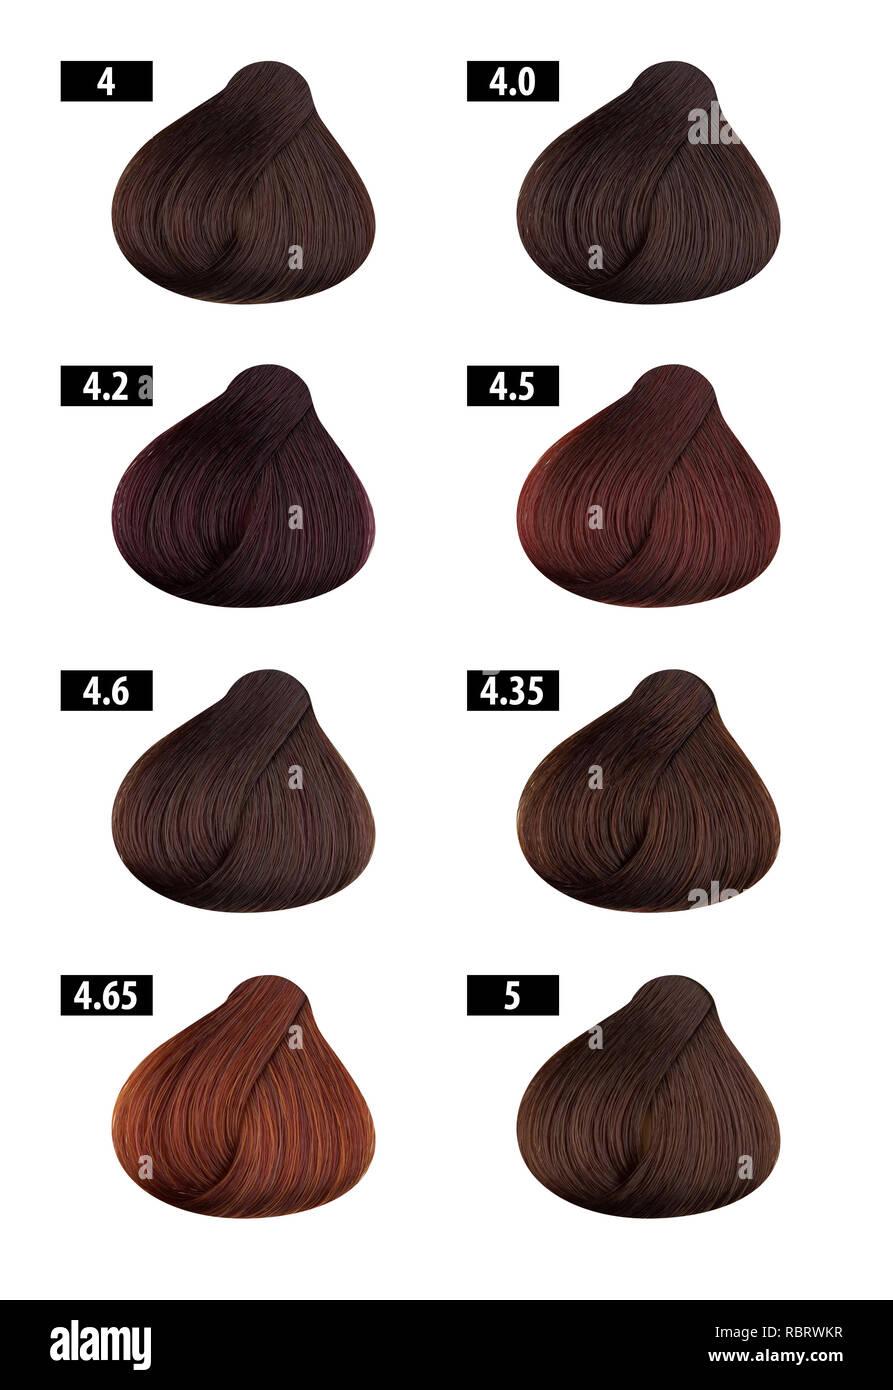 Haarfarbe welche farbe